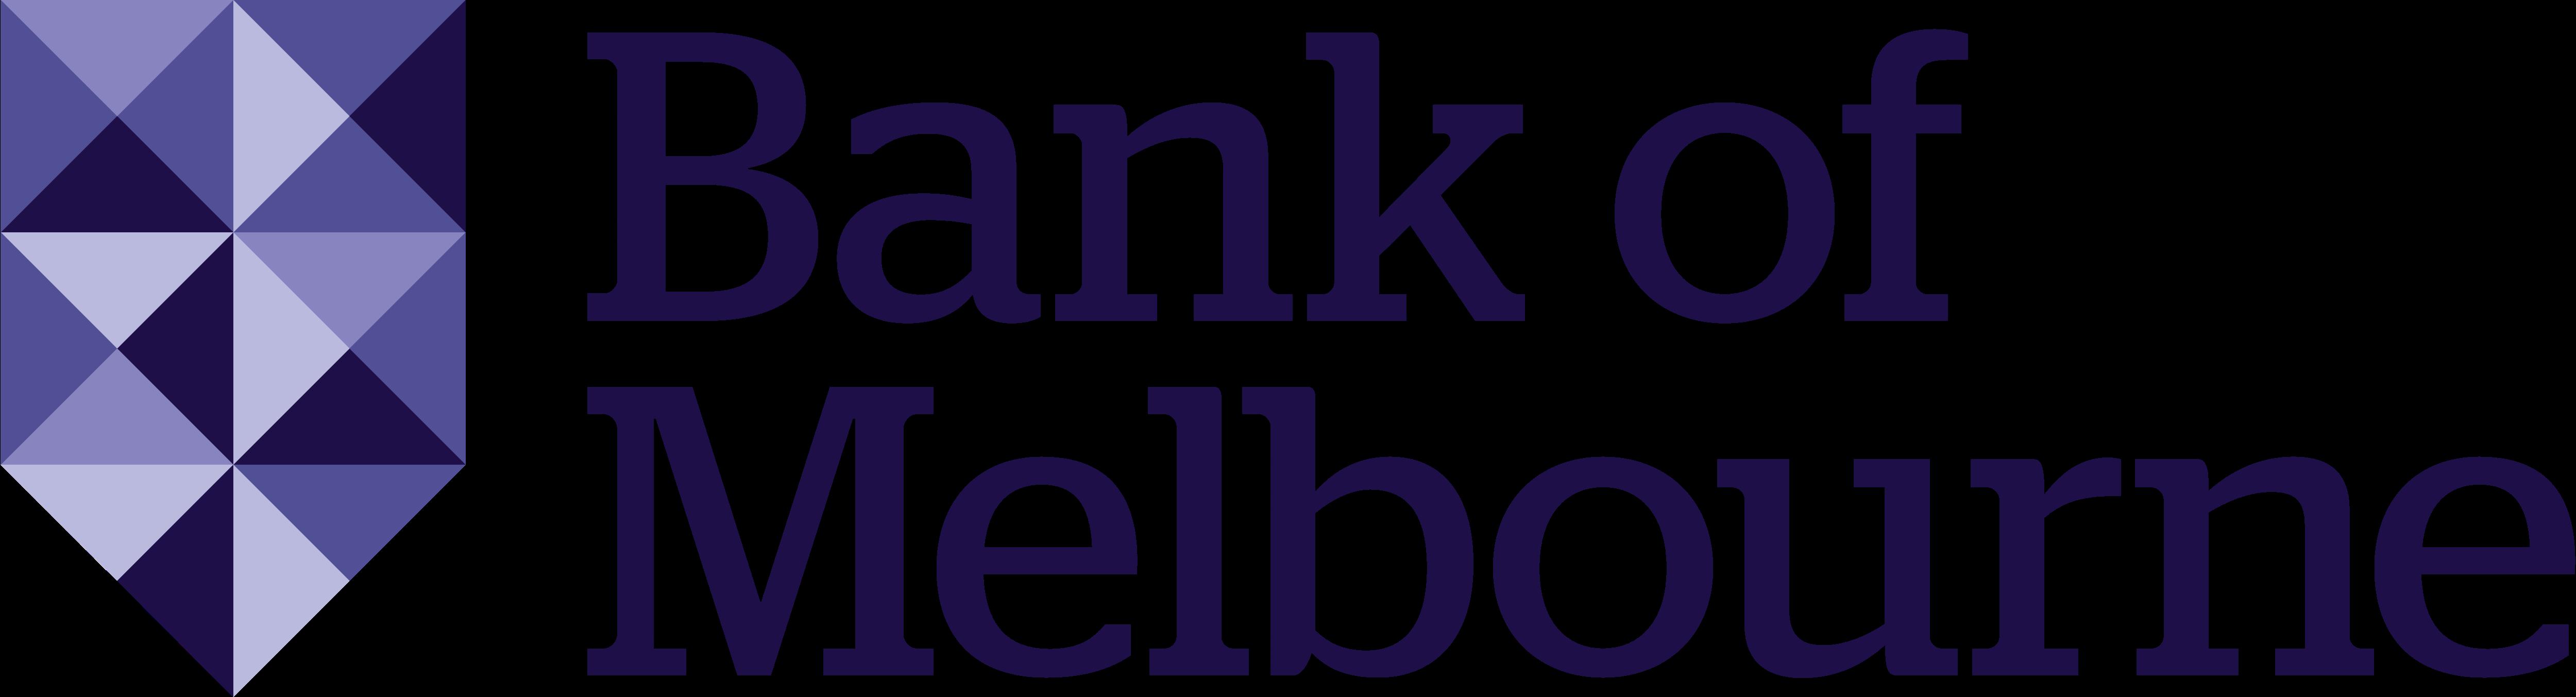 Bank_of_Melbourne_logo